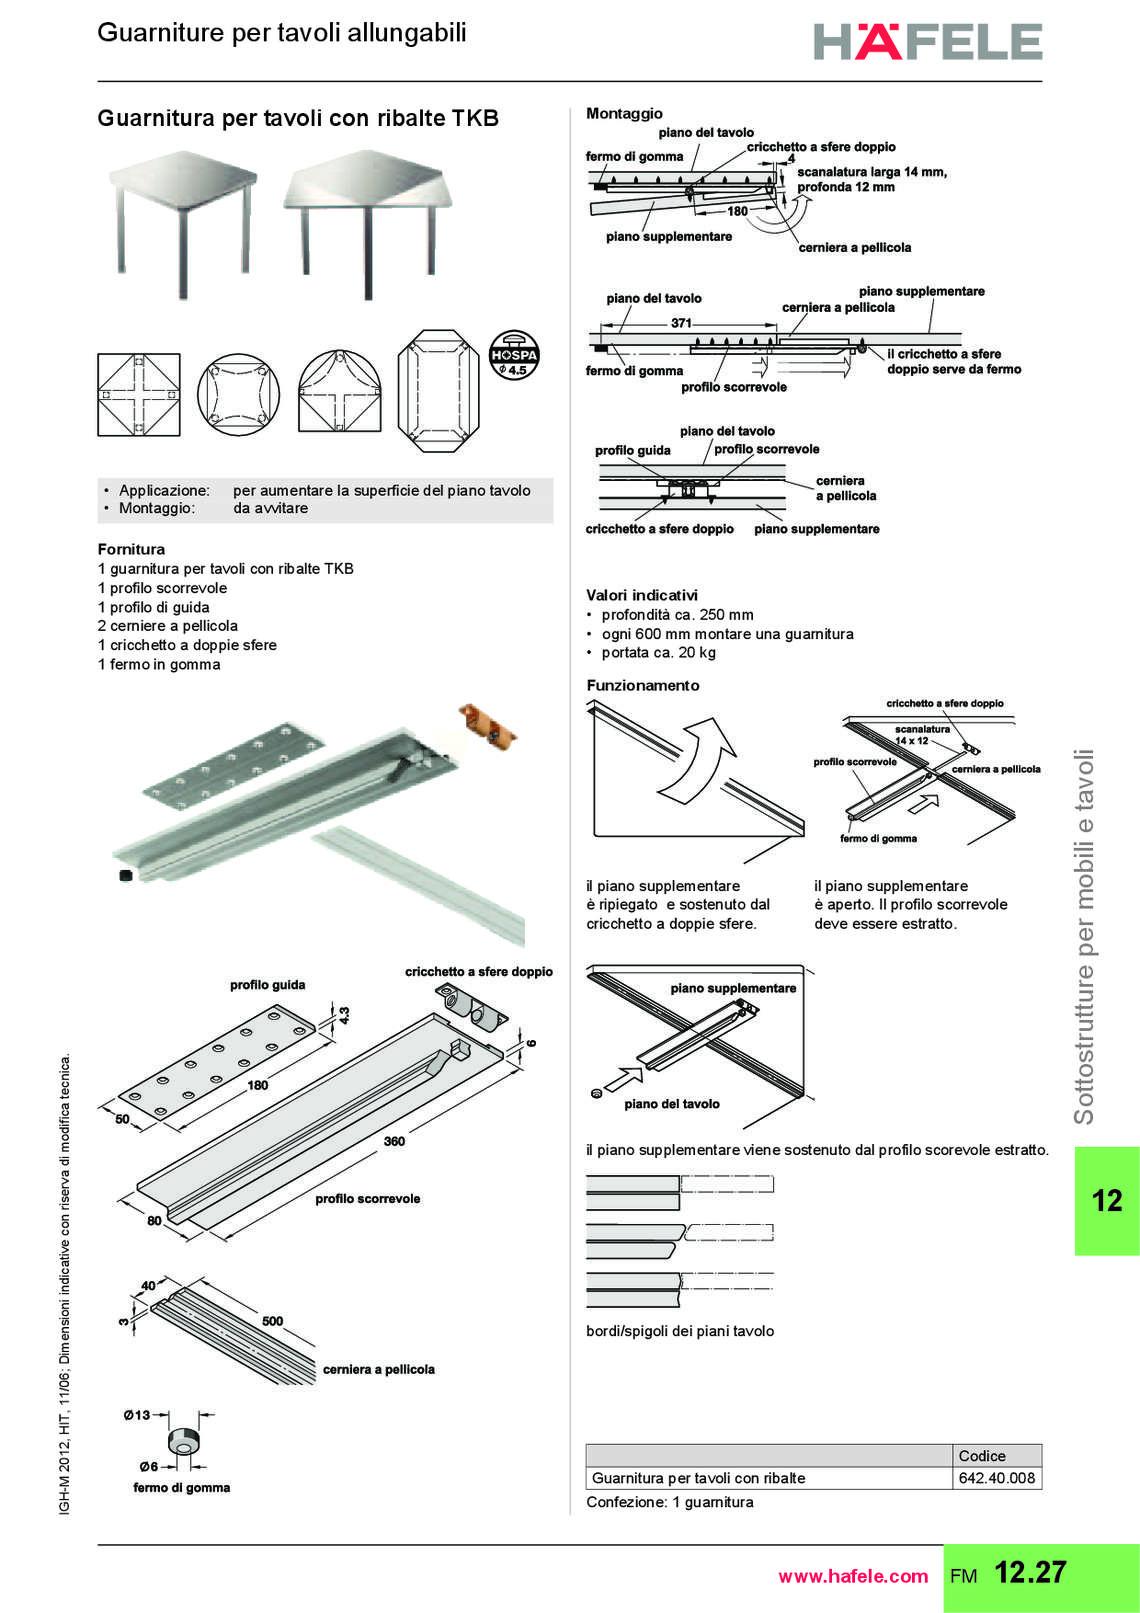 hafele-sottostrutture-per-mobili_83_048.jpg